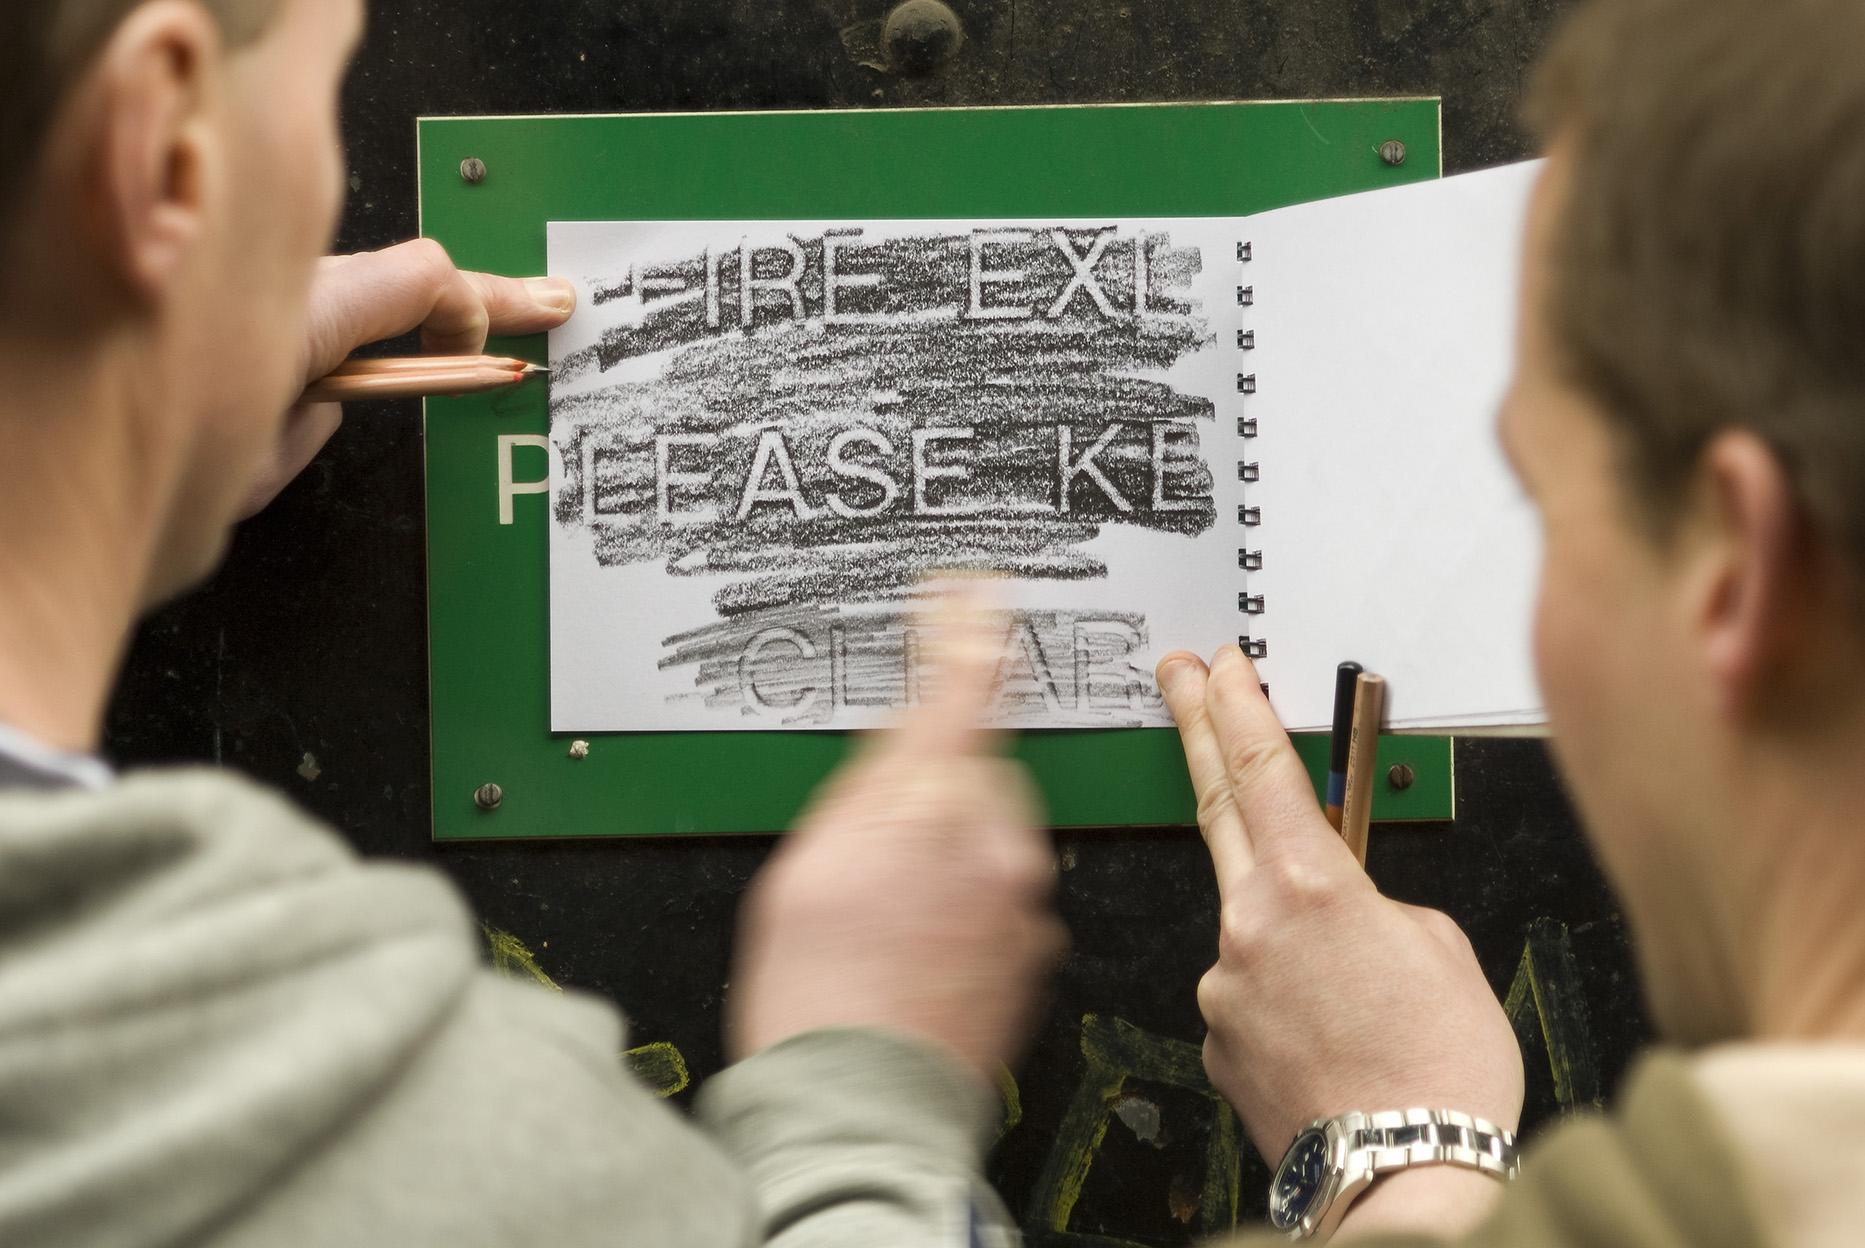 LU staff Southwark_making rubbings.jpg